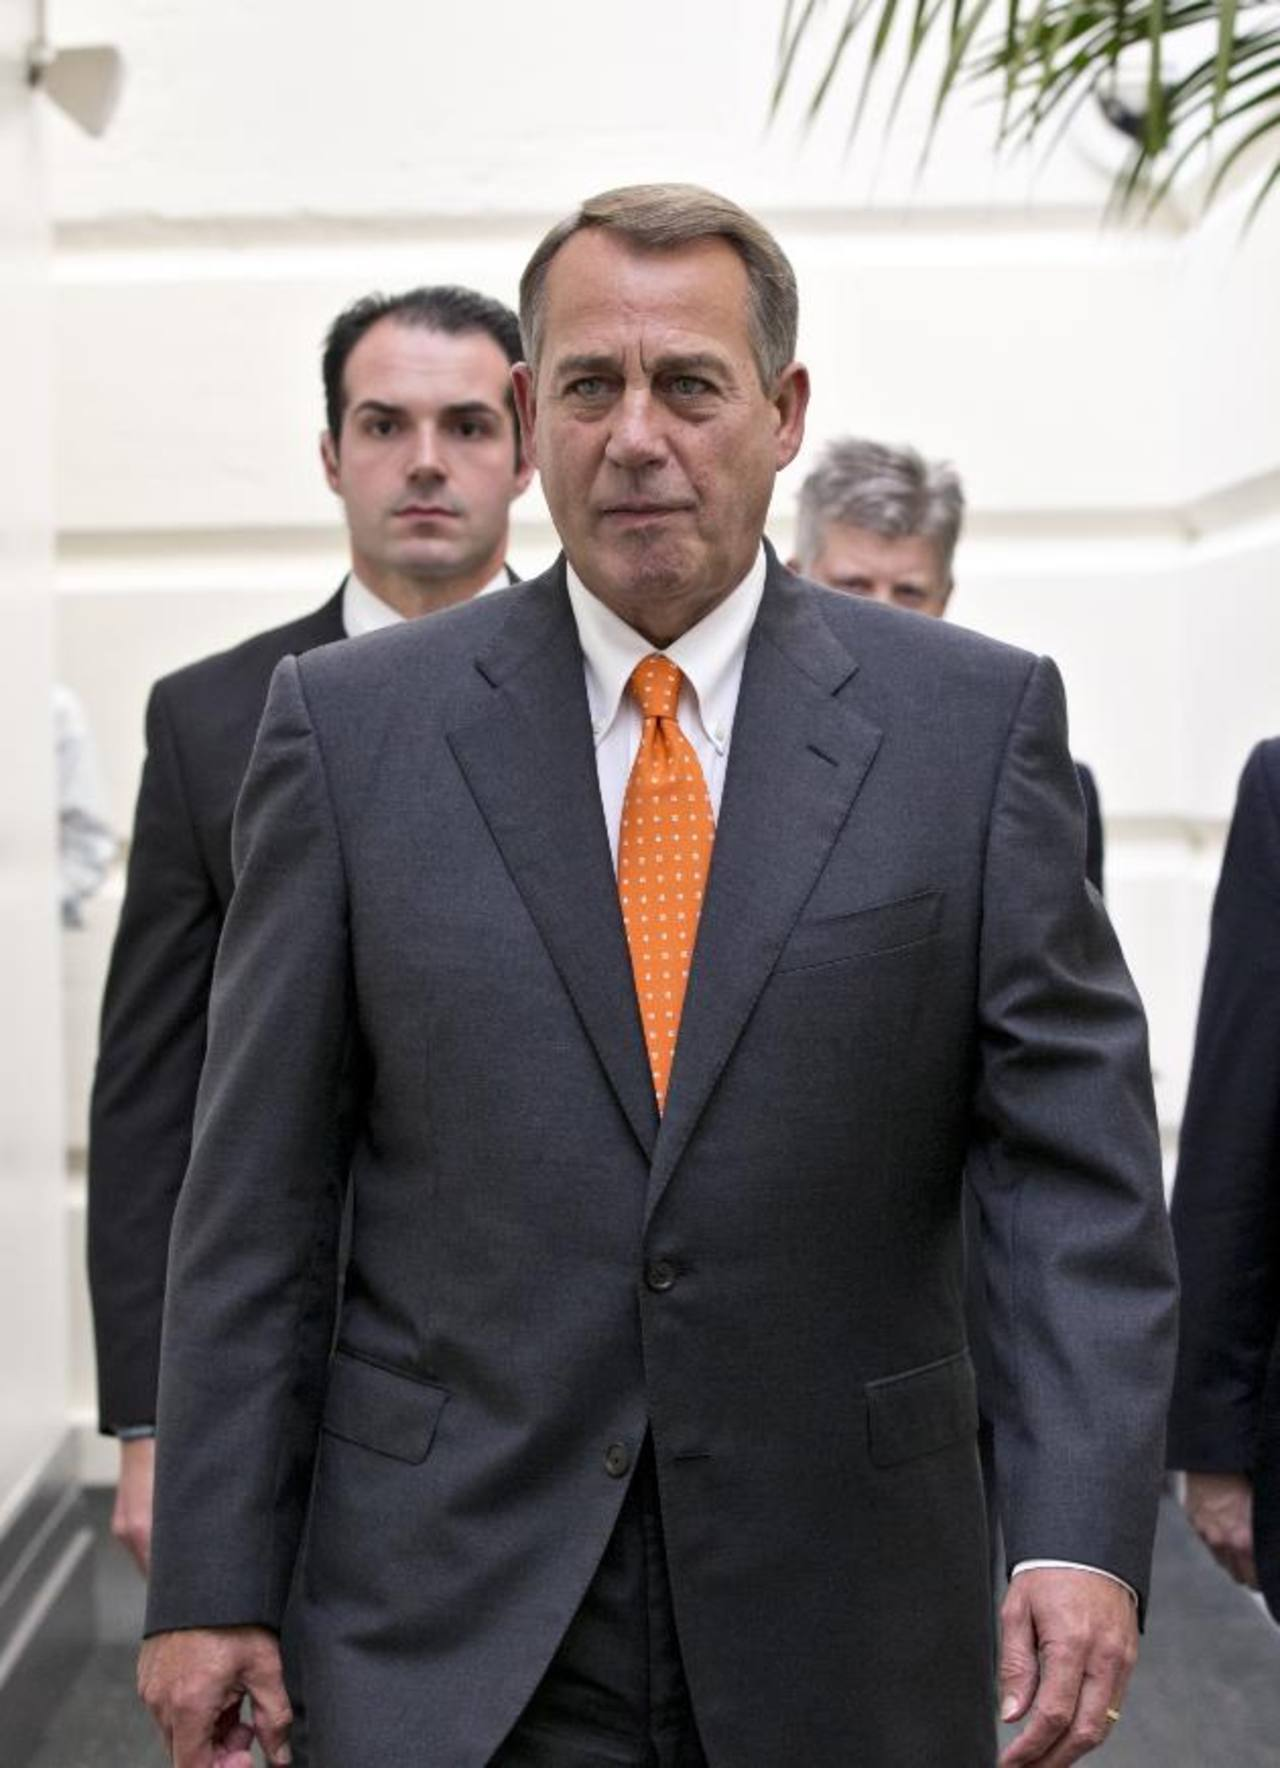 John Boehner, presidente de la Cámara de Representantes de Estados Unidos.